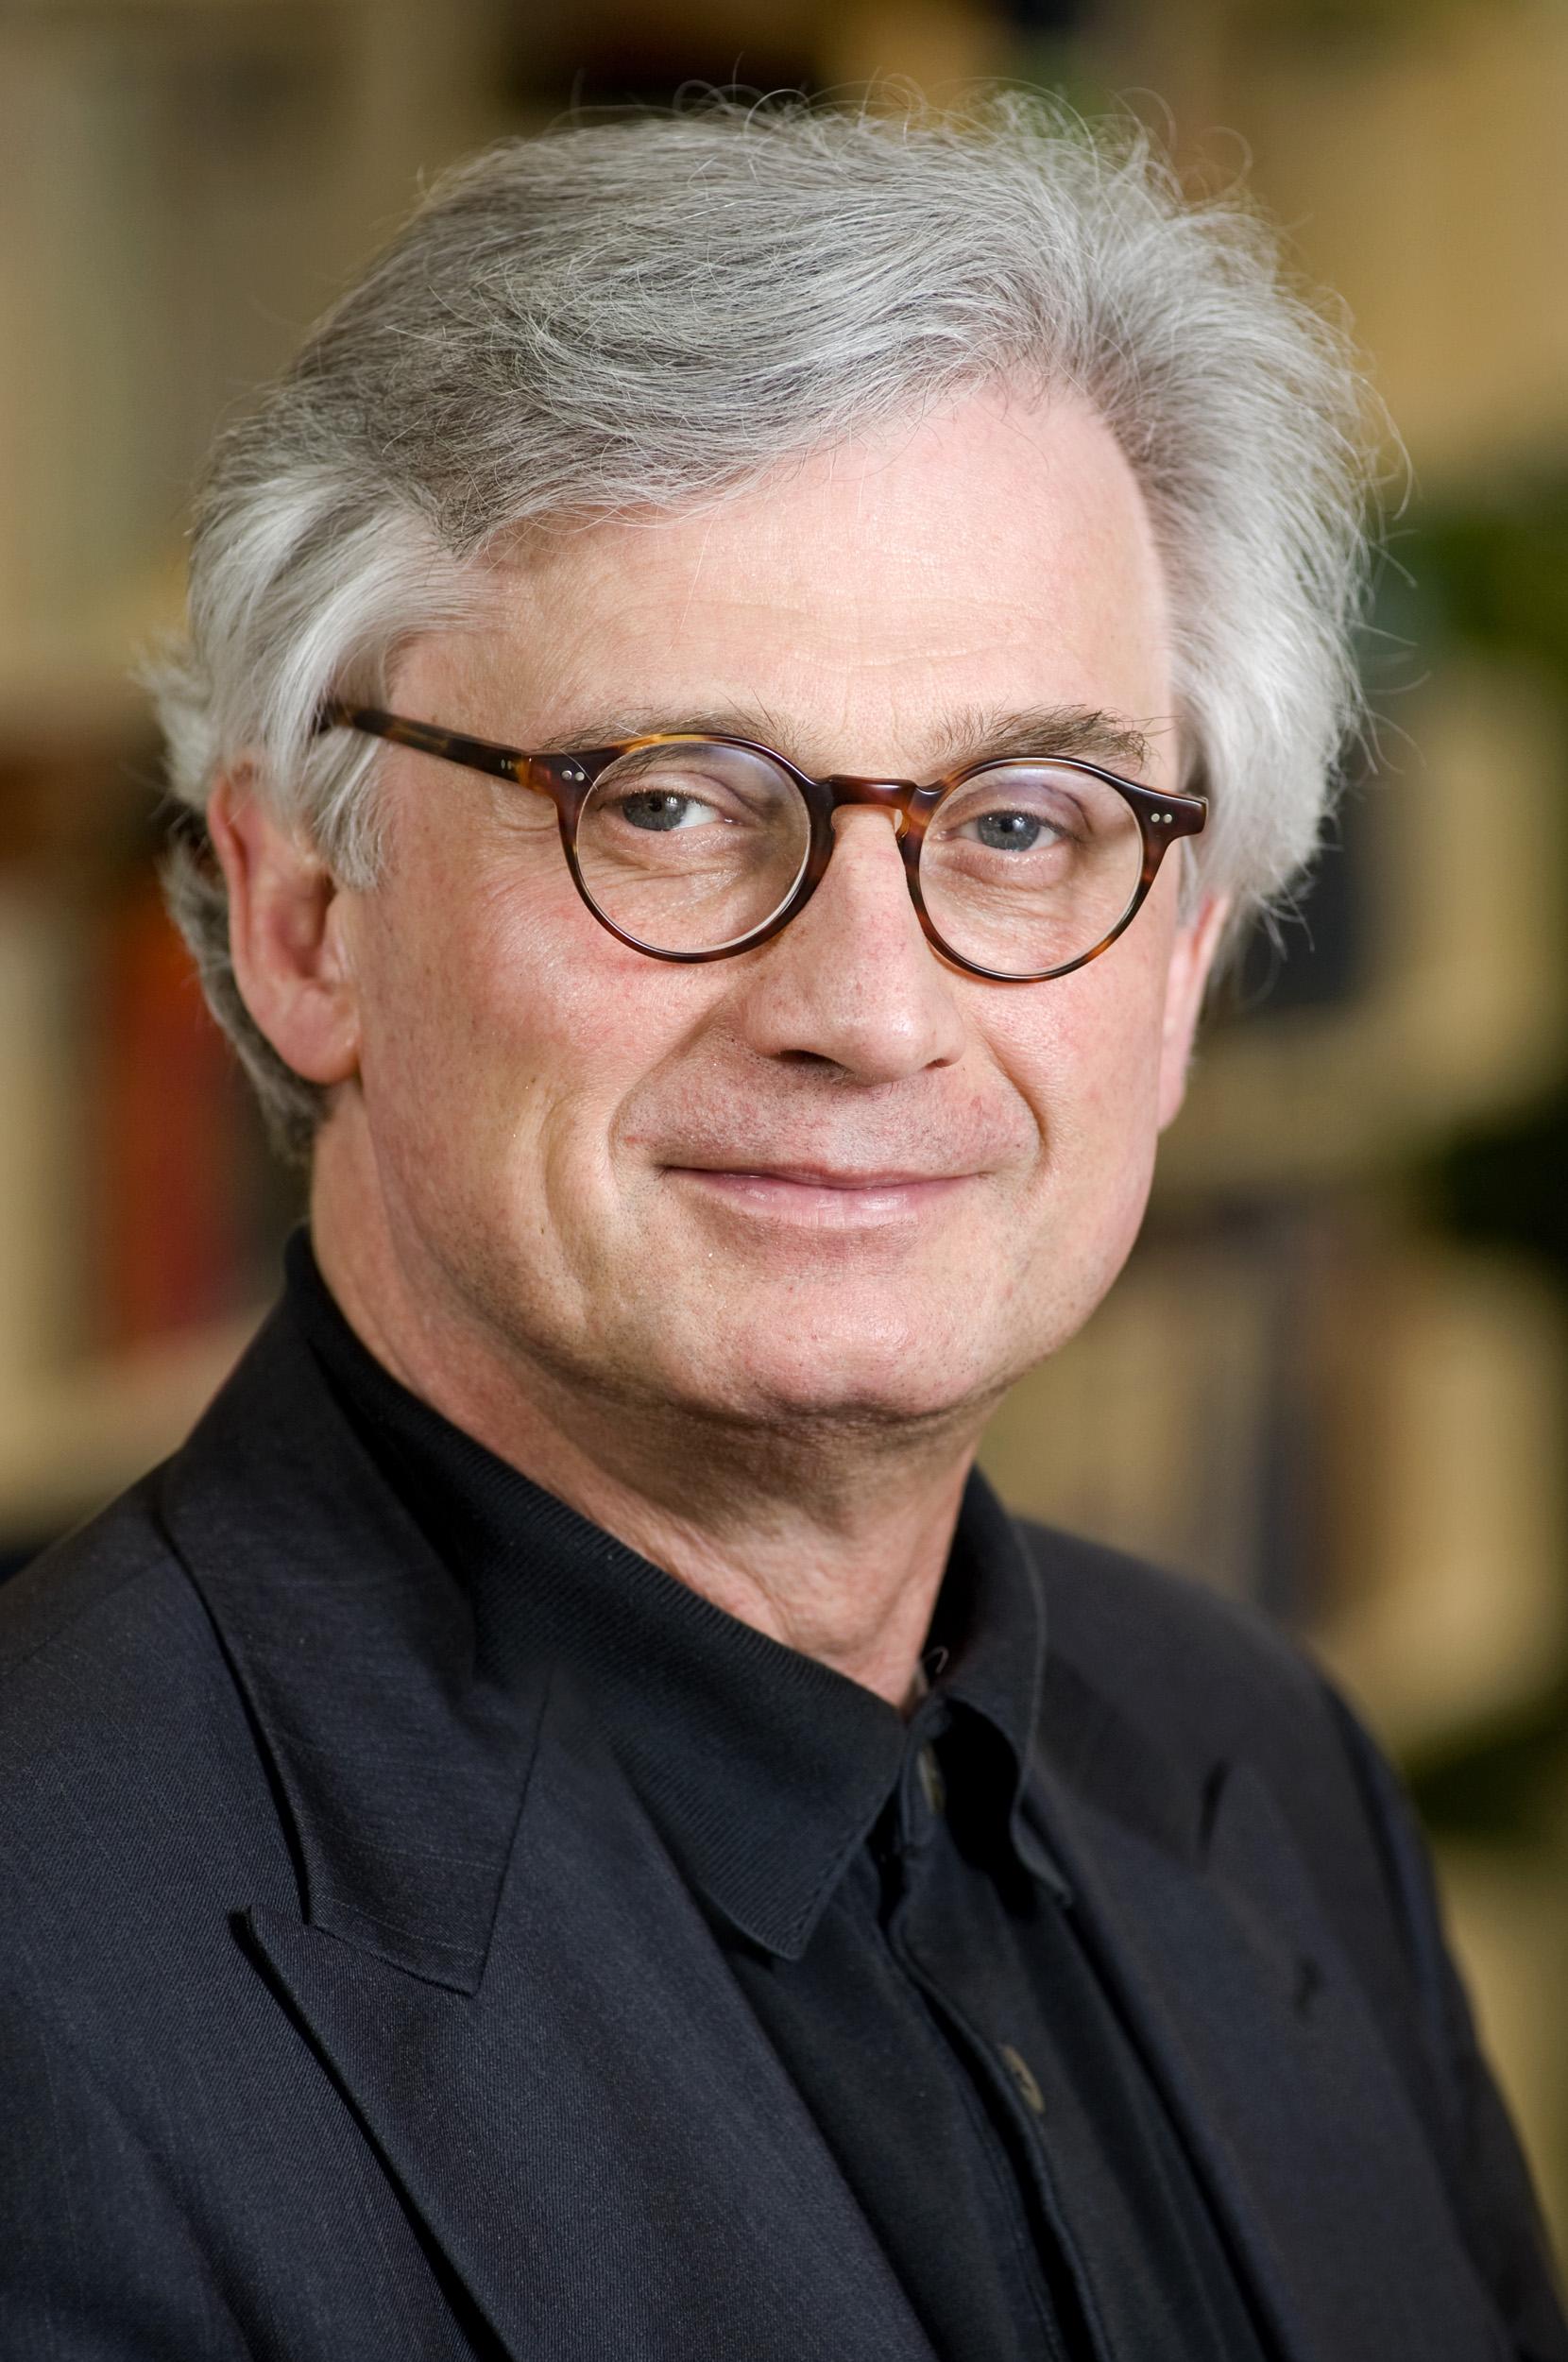 Prof. Dr. Hartmut Remmers